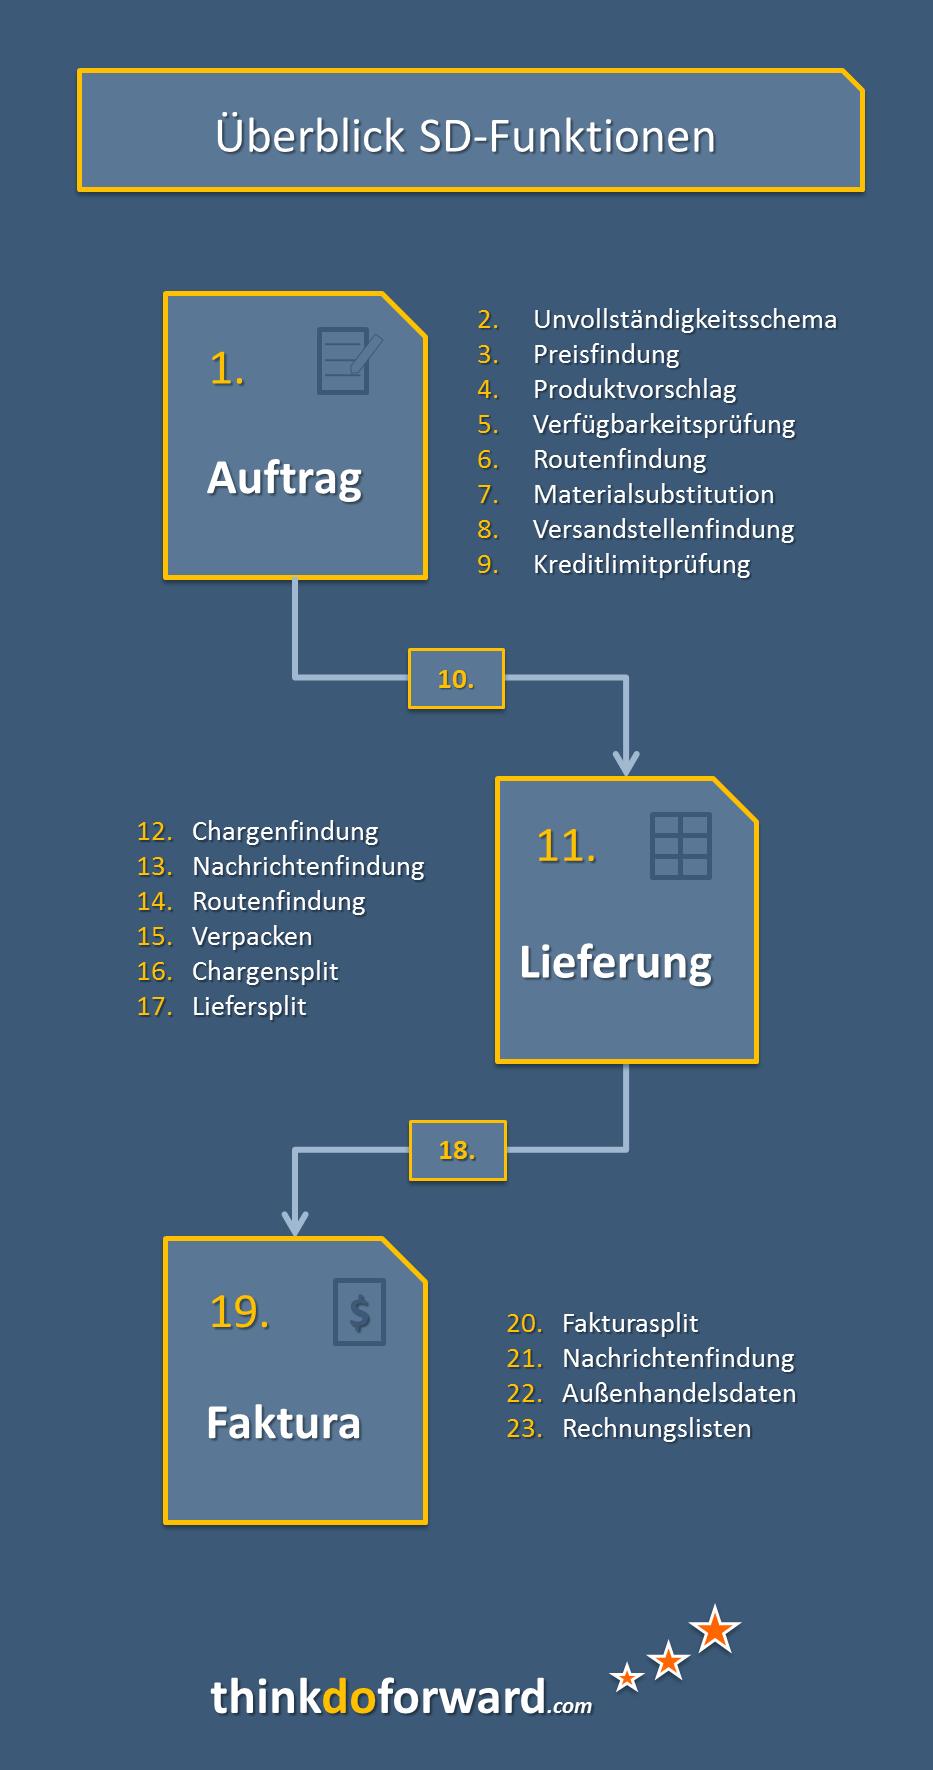 sd_funktionen_23